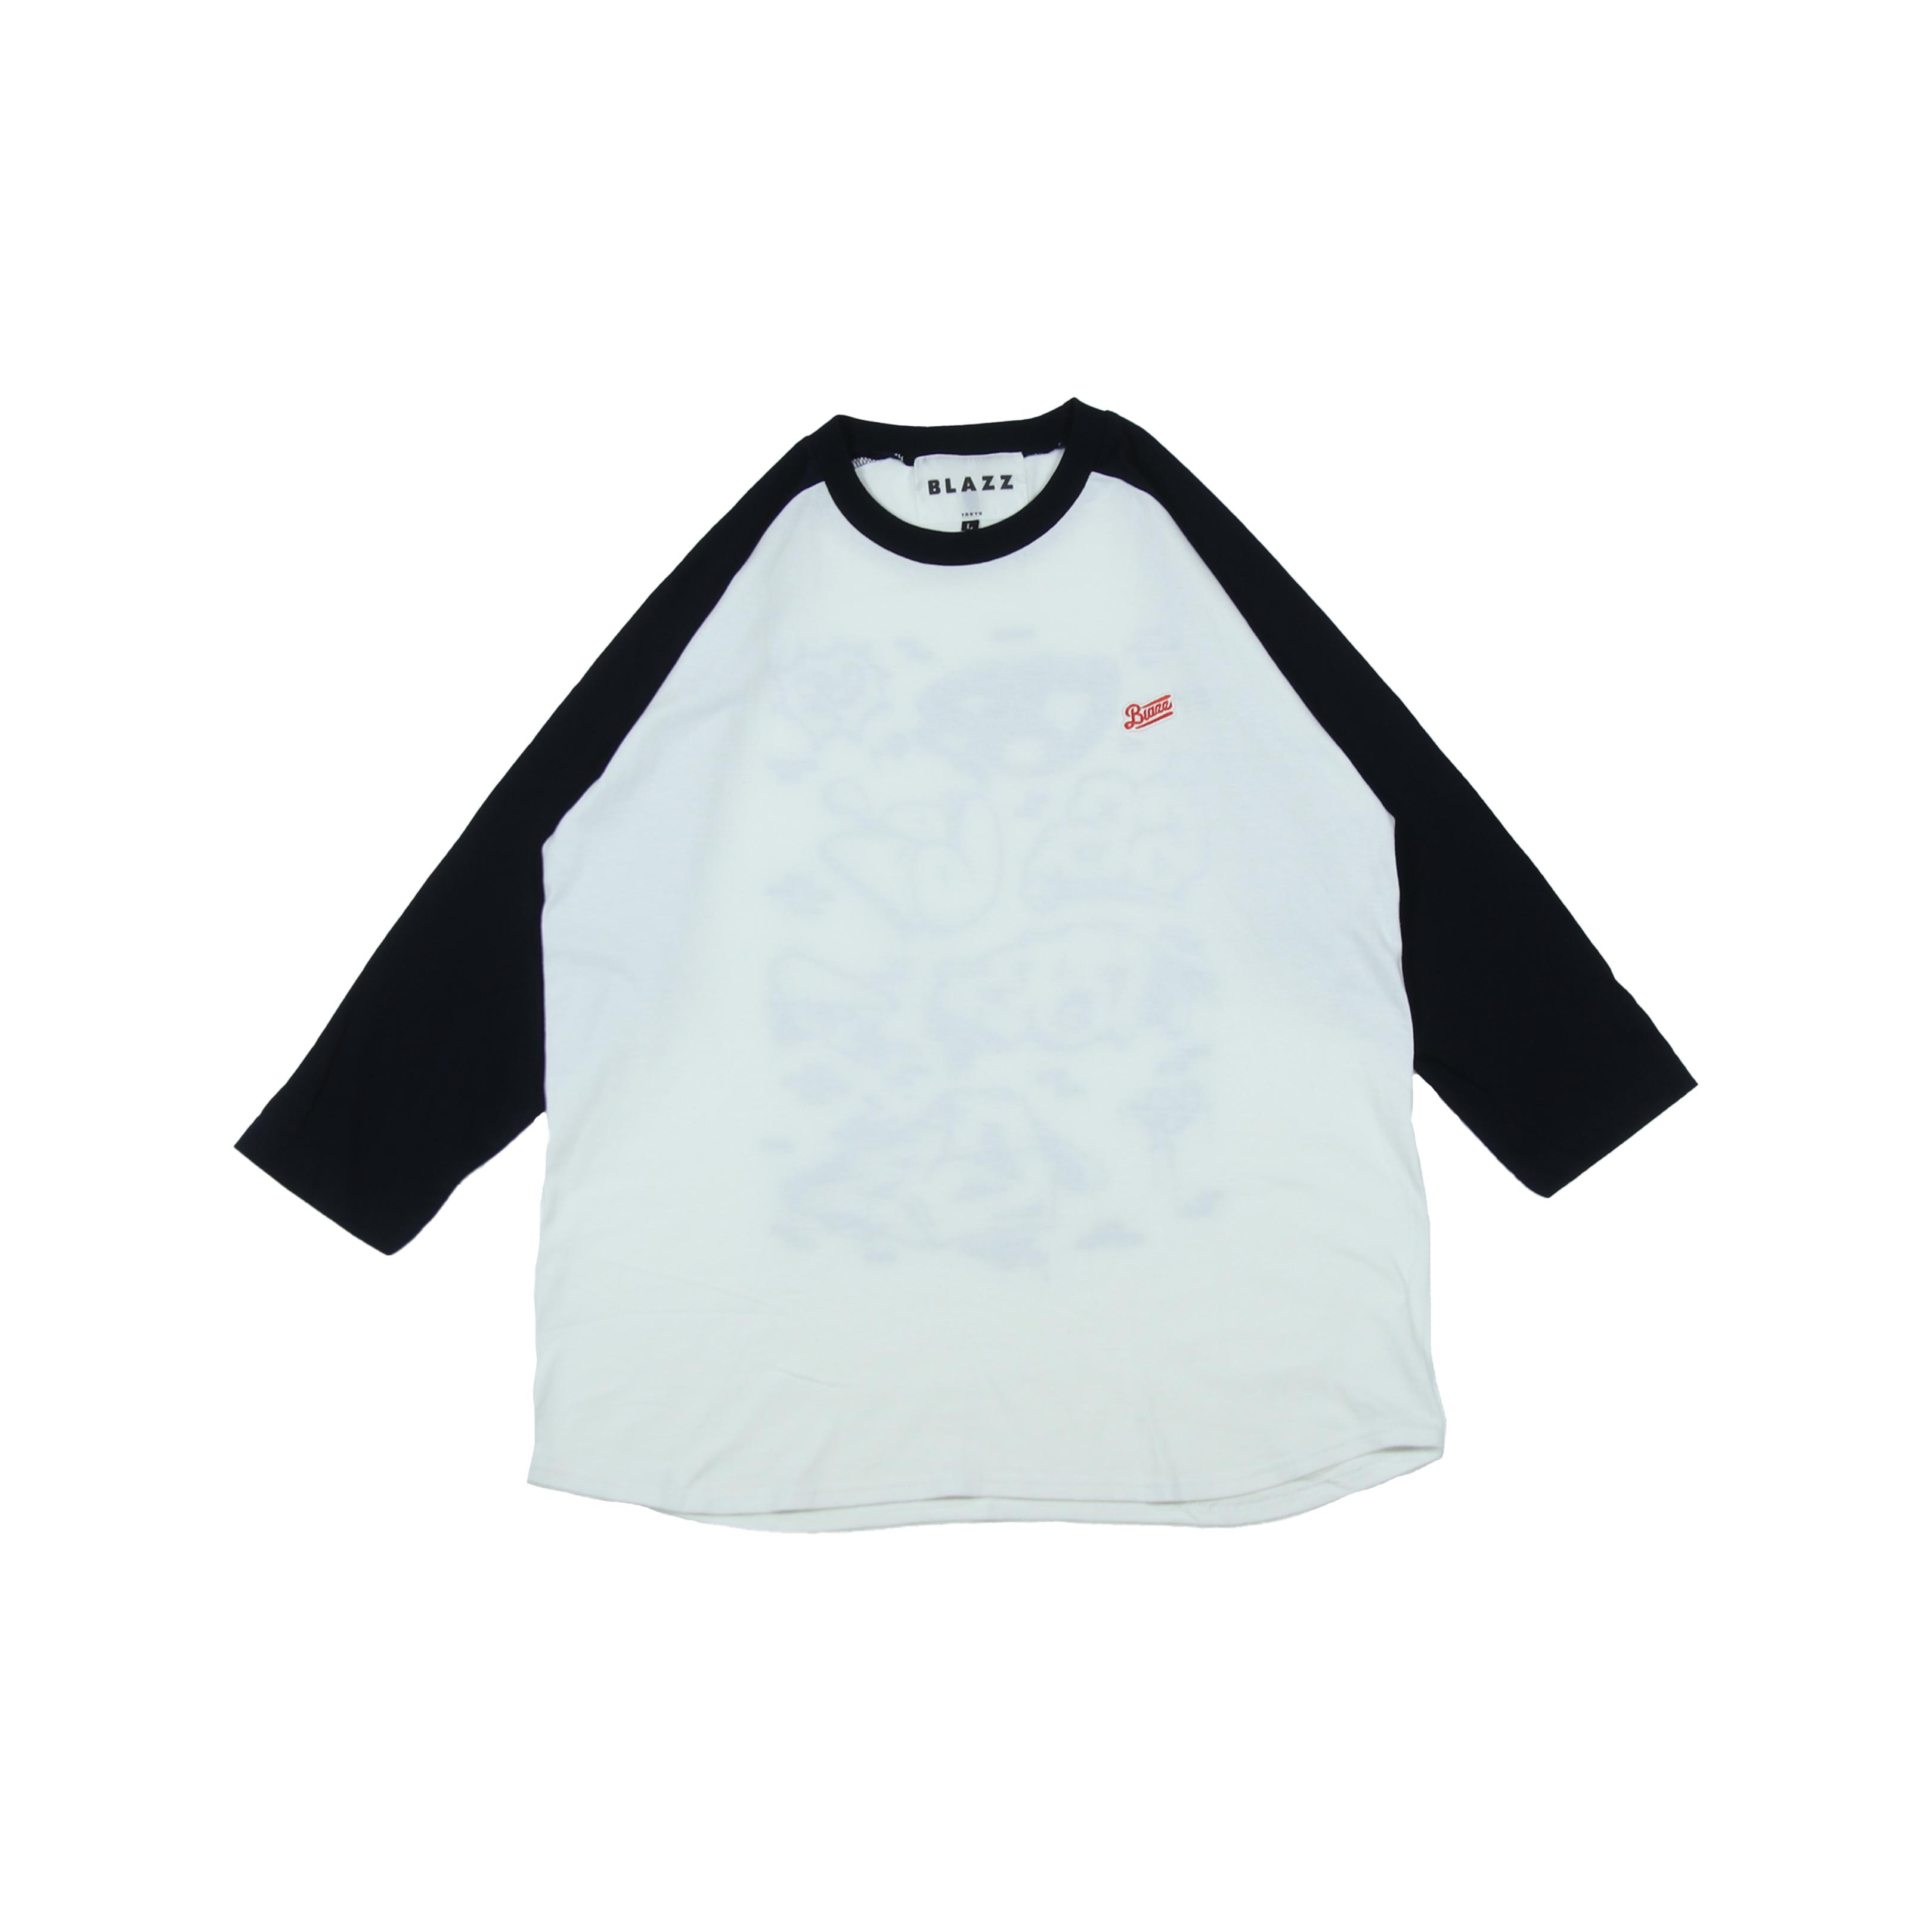 6th Wall by ATOMONE raglan 3/4 sleeve [ WHITE x NAVY ]